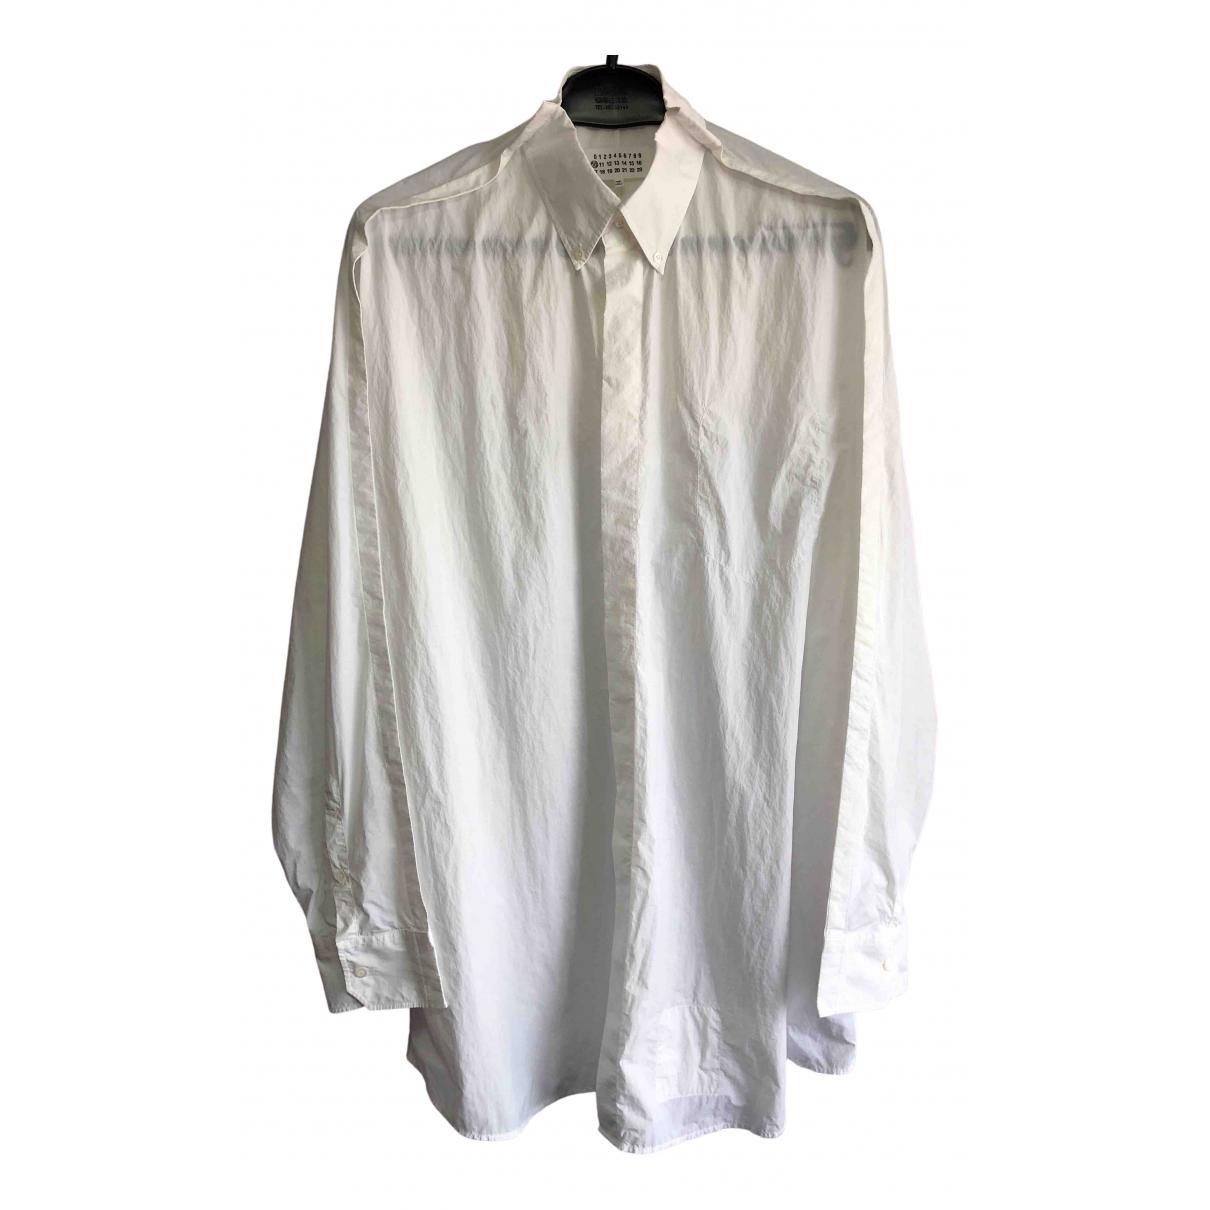 Maison Martin Margiela \N White Shirts for Men 38 EU (tour de cou / collar)